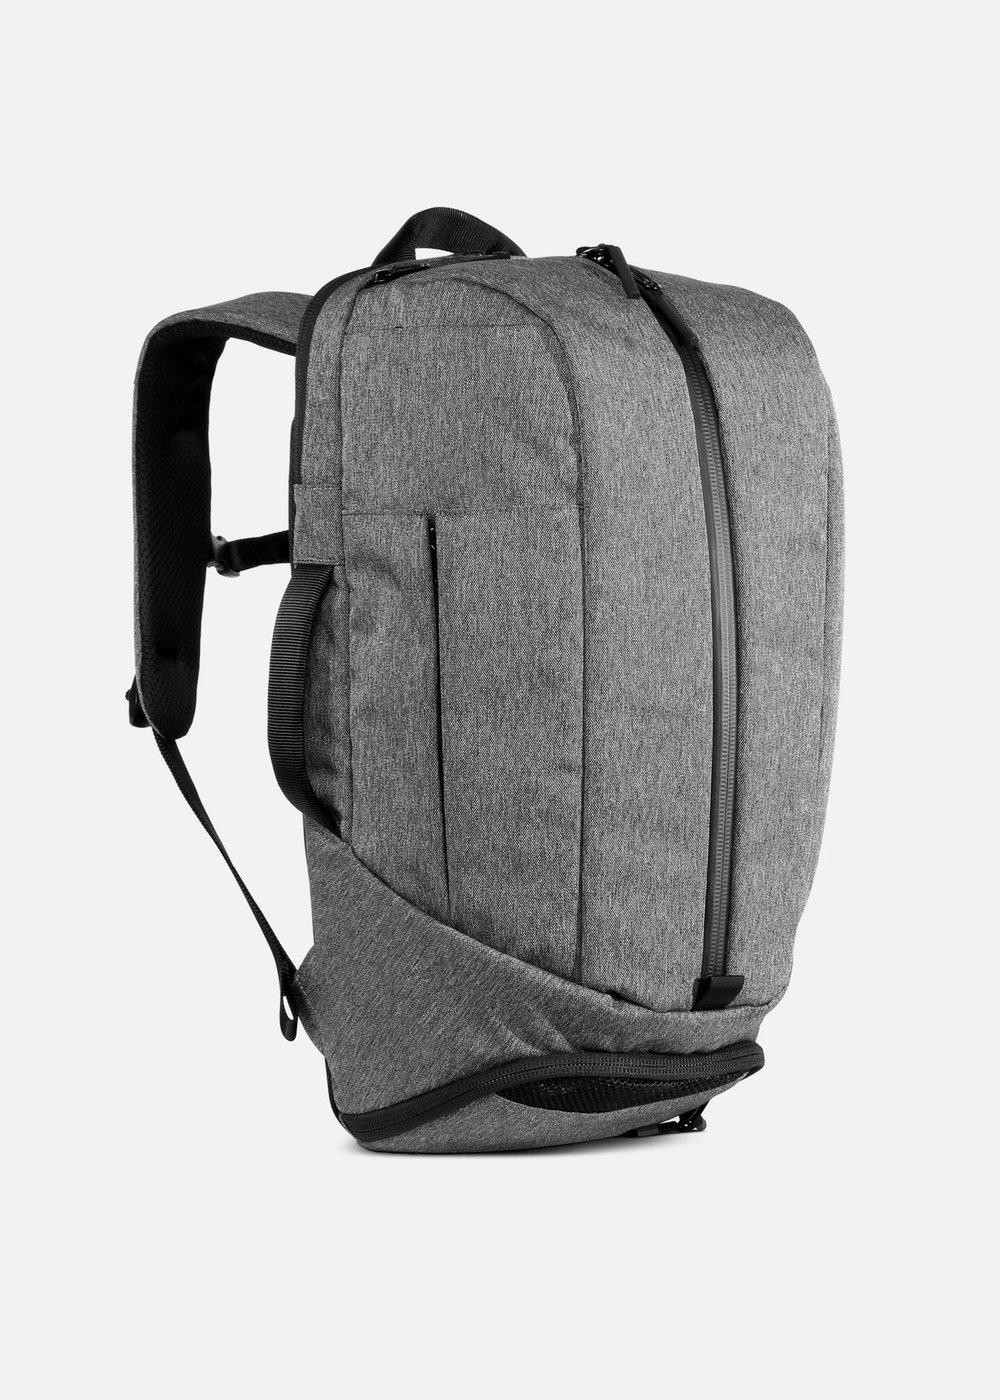 Aer Duffel Pack Best Gym/Work Pack Backpack